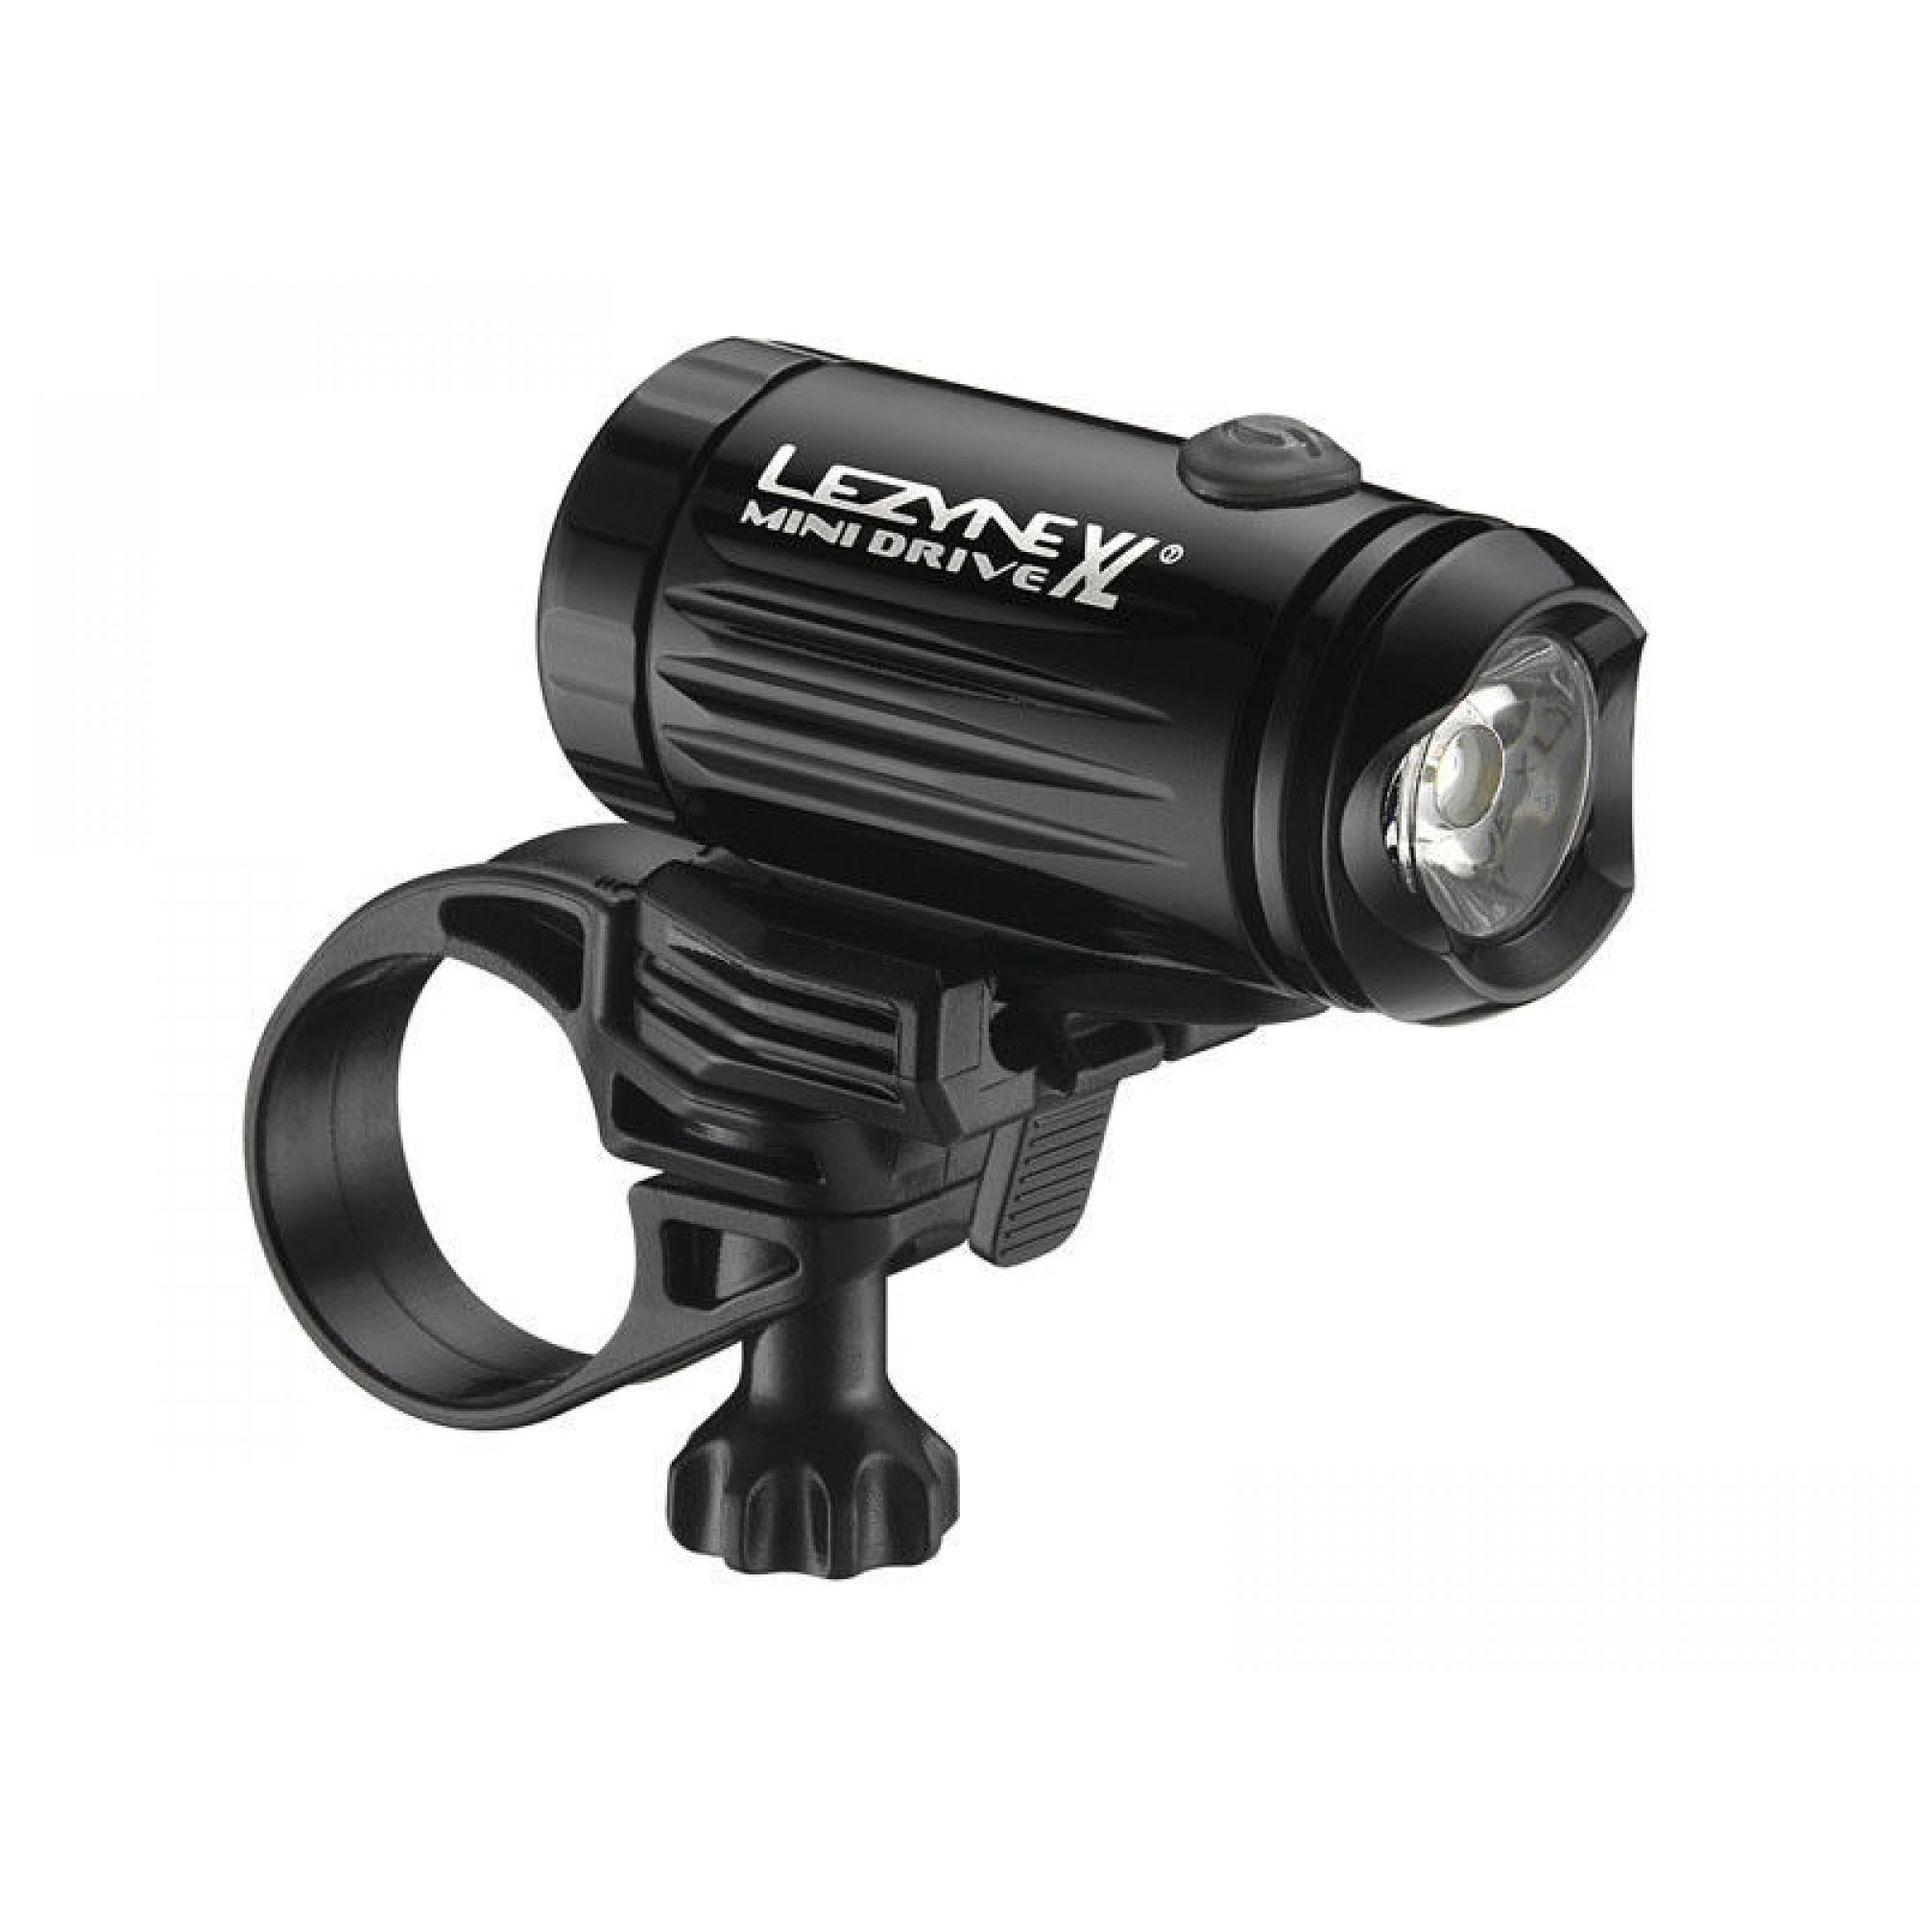 LAMPKA ROWEROWA PRZEDNIA LEZYNE LED MINI DRIVE XL